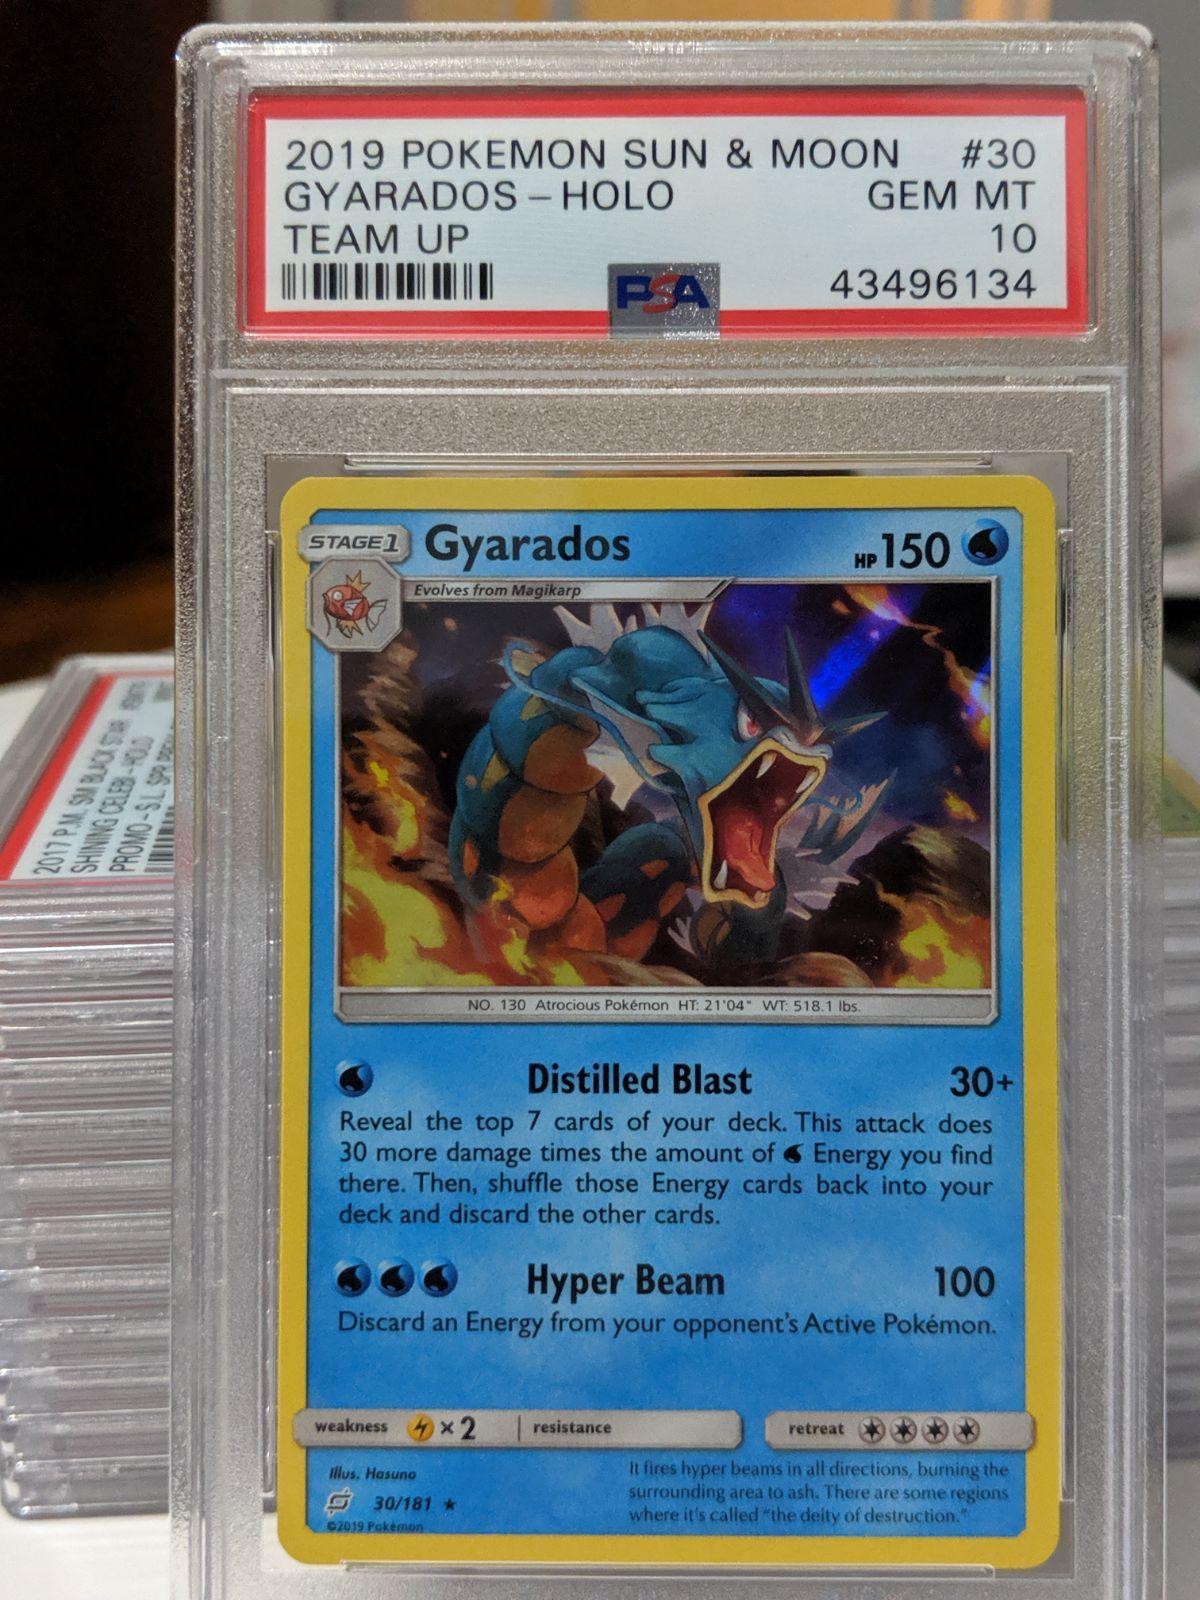 Psa gem mint 10 gyarados 30 from teamp up set pokemon